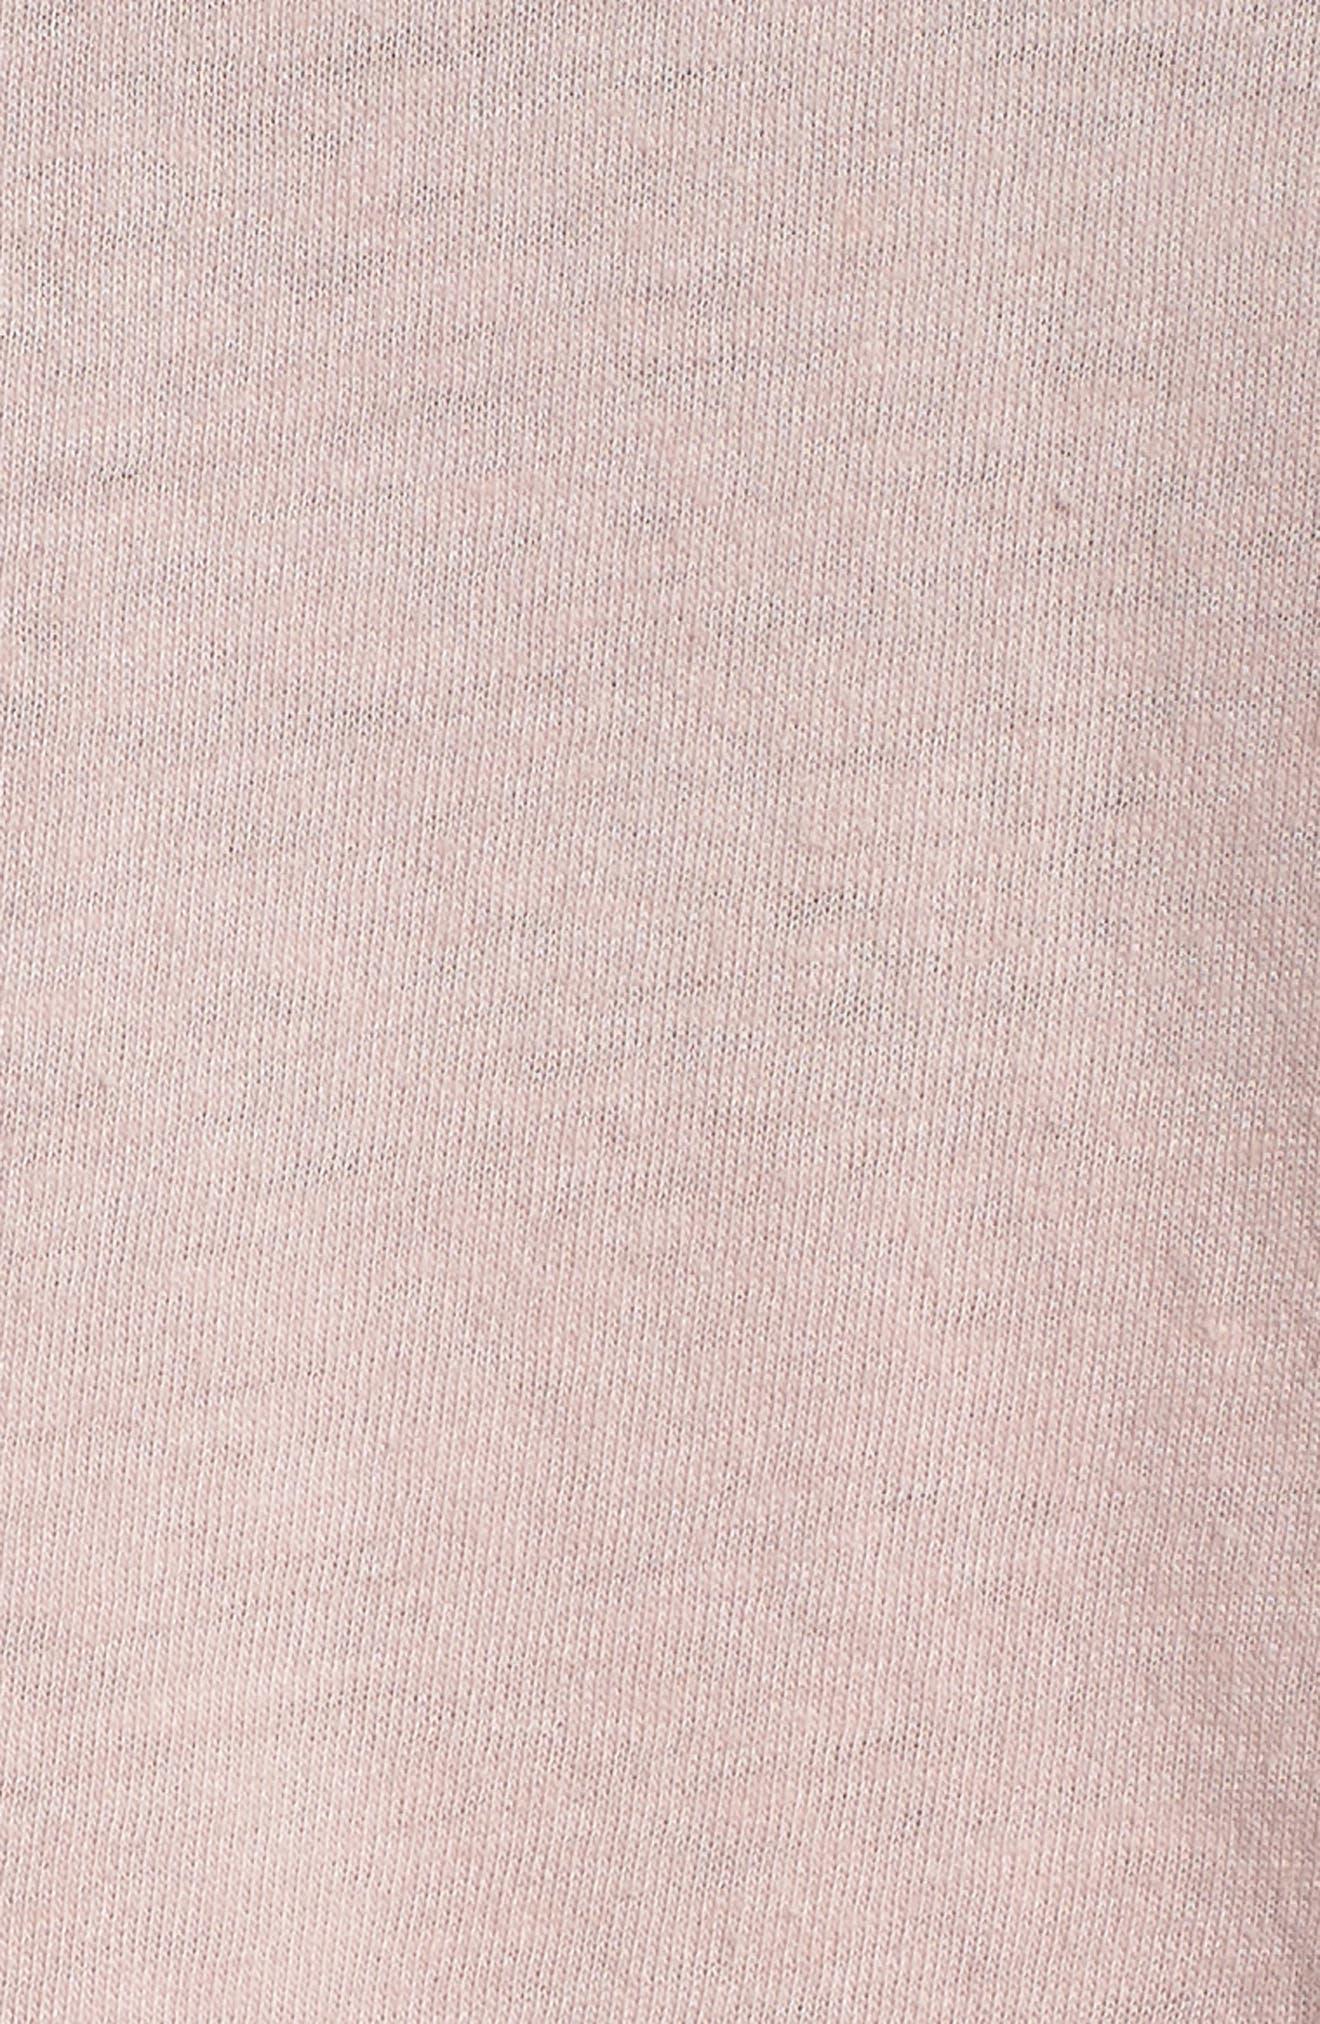 Namaste Cotton Blend Crop Tank Top,                             Alternate thumbnail 6, color,                             650